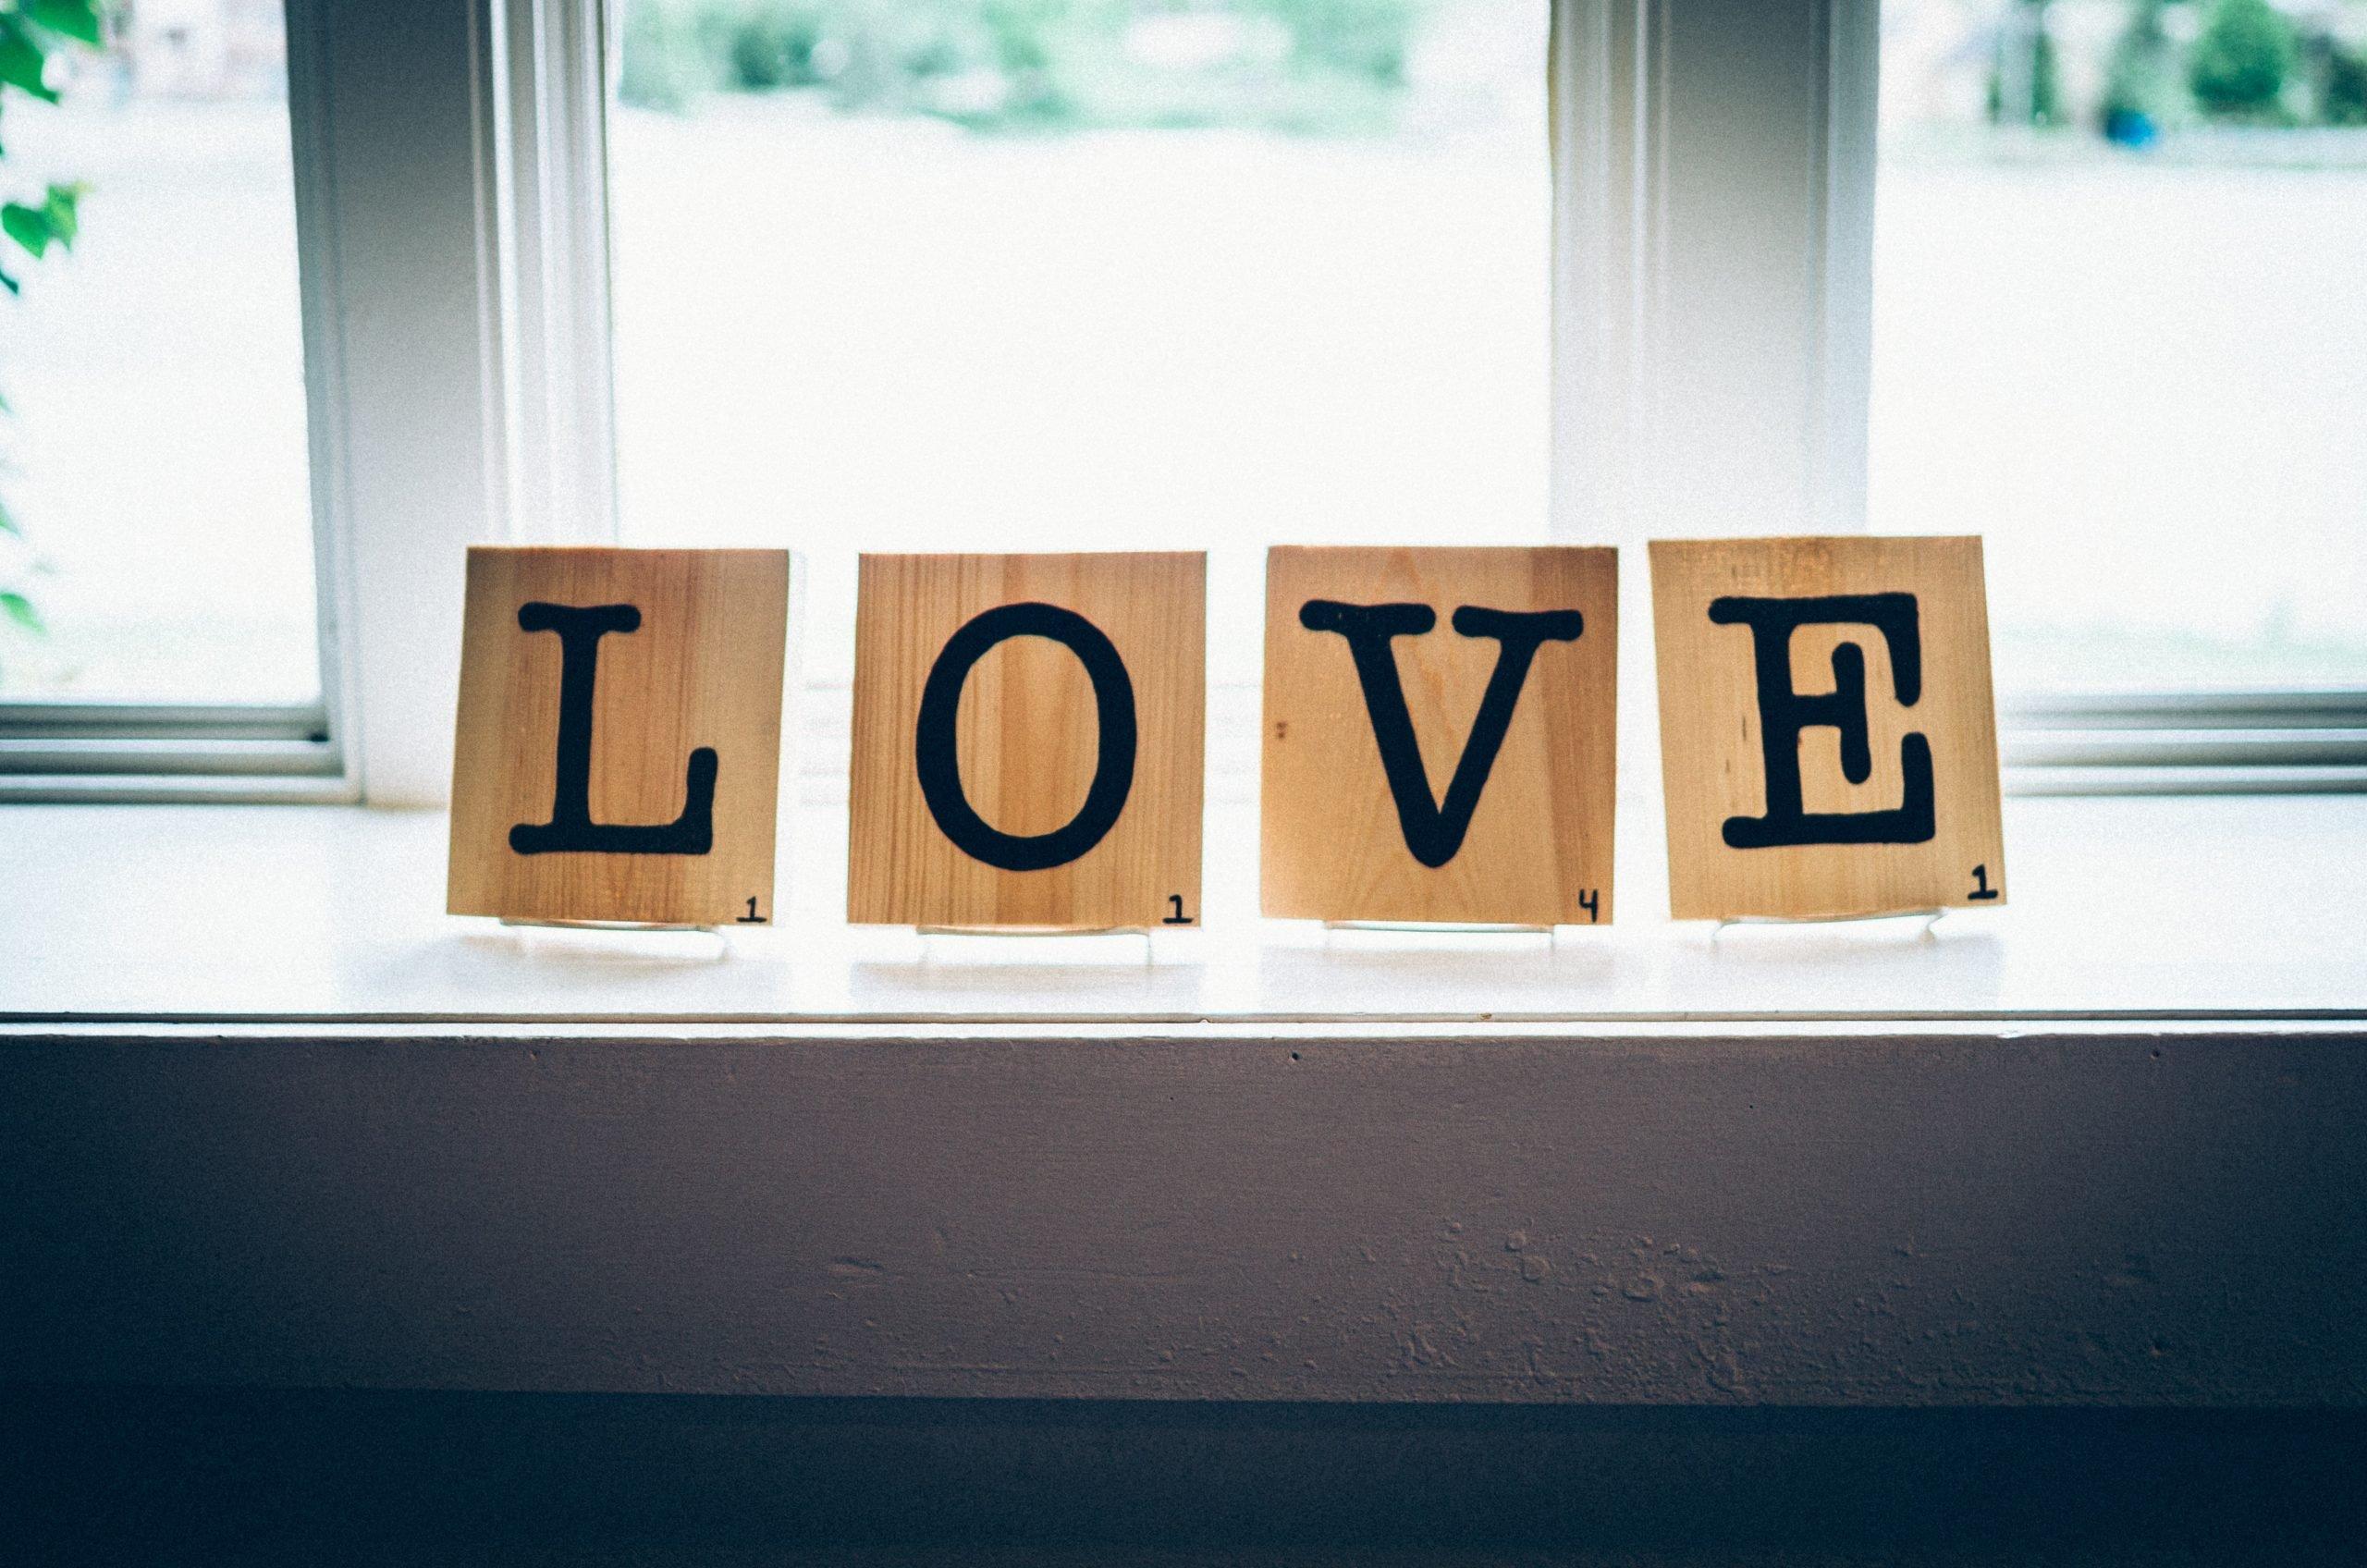 Love Tiles in the window